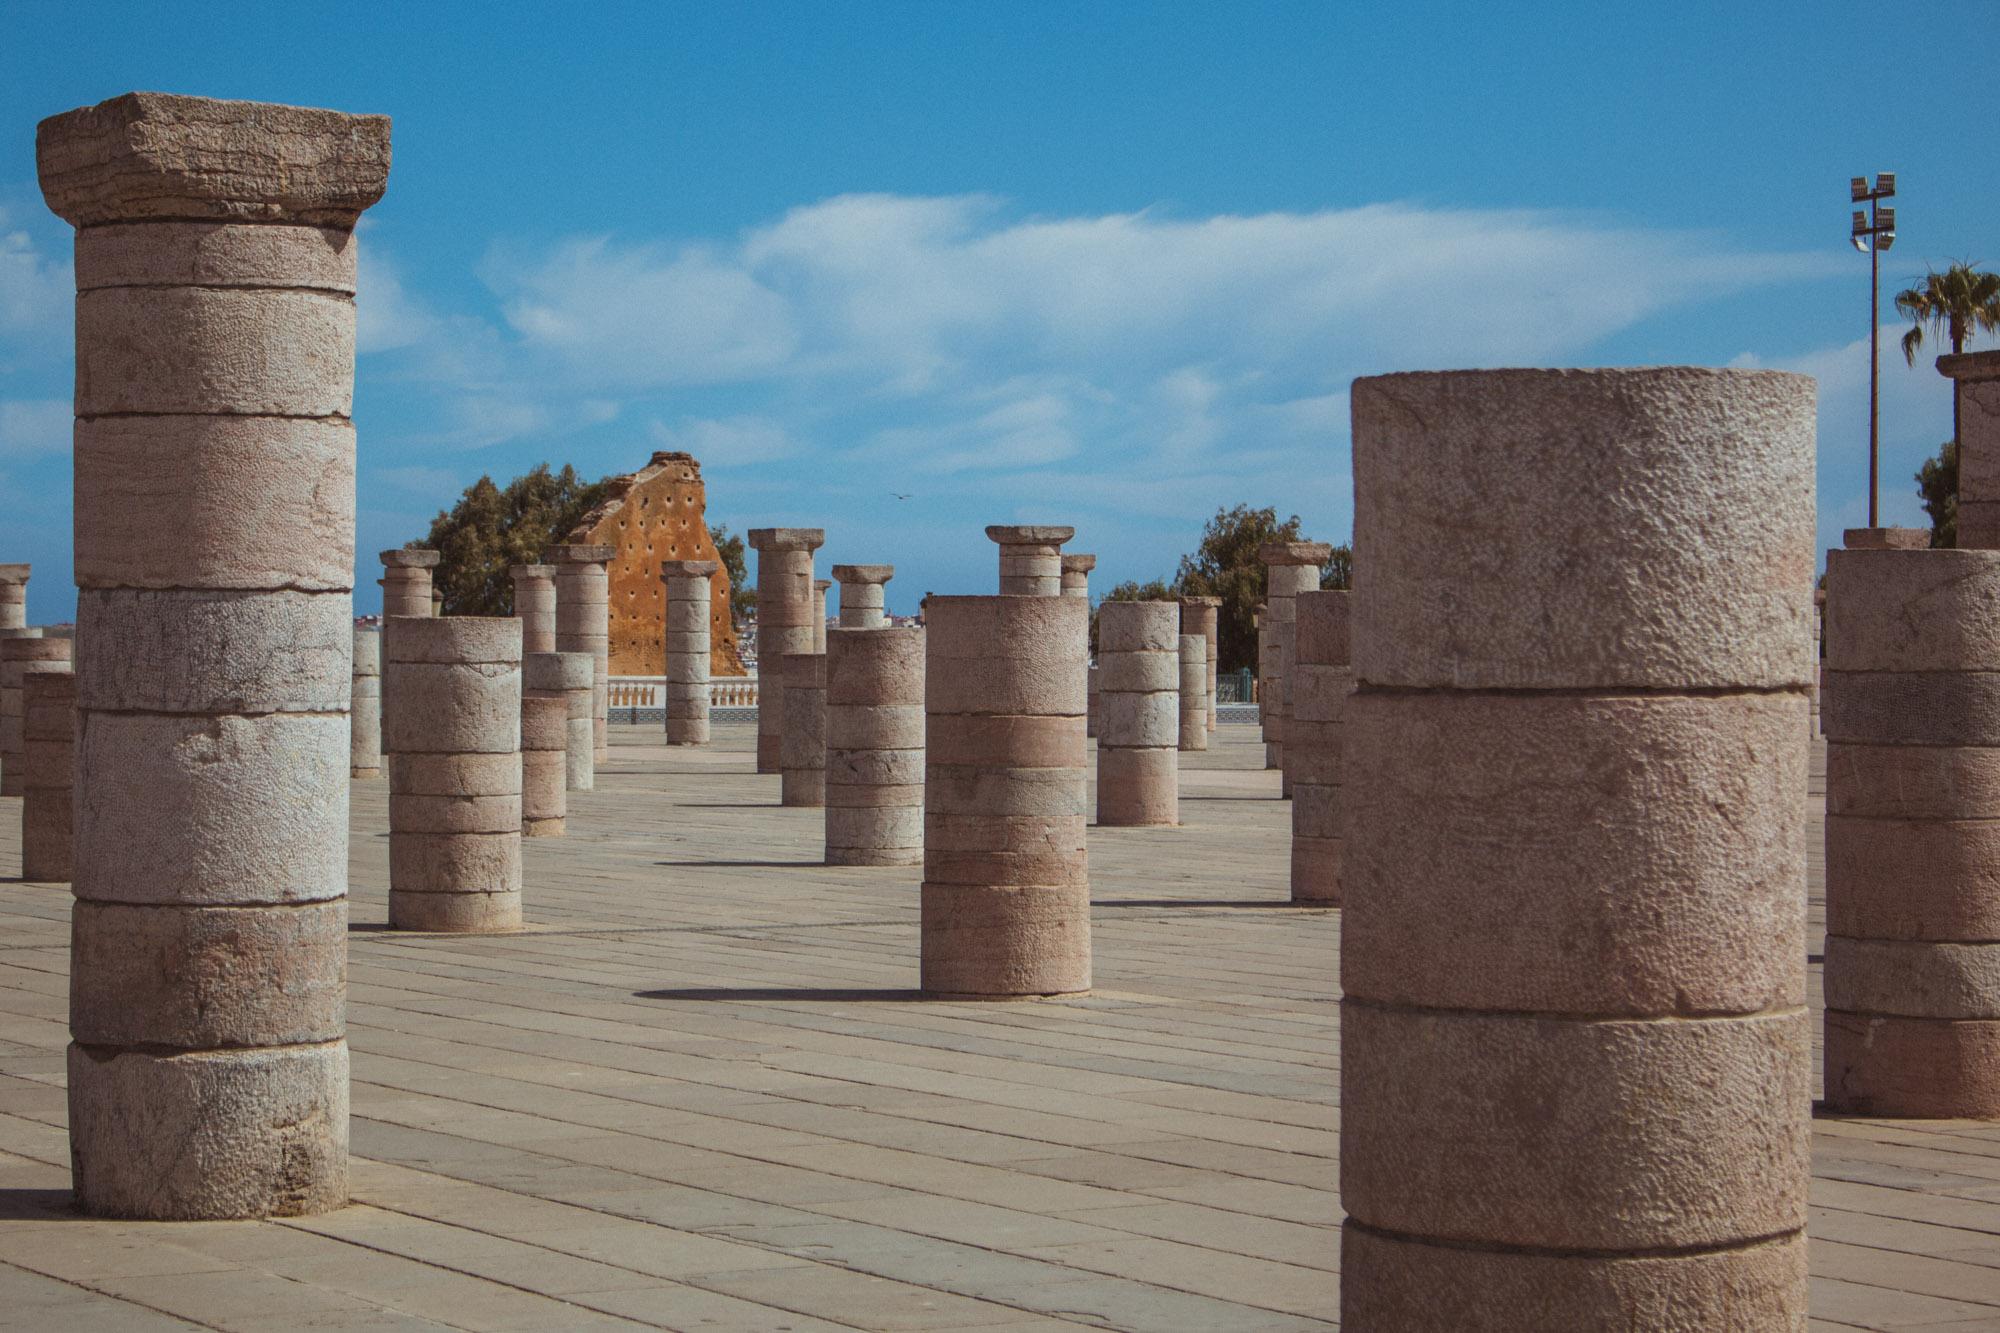 Mausoleum von Mohammed V in Rabat, Marokko